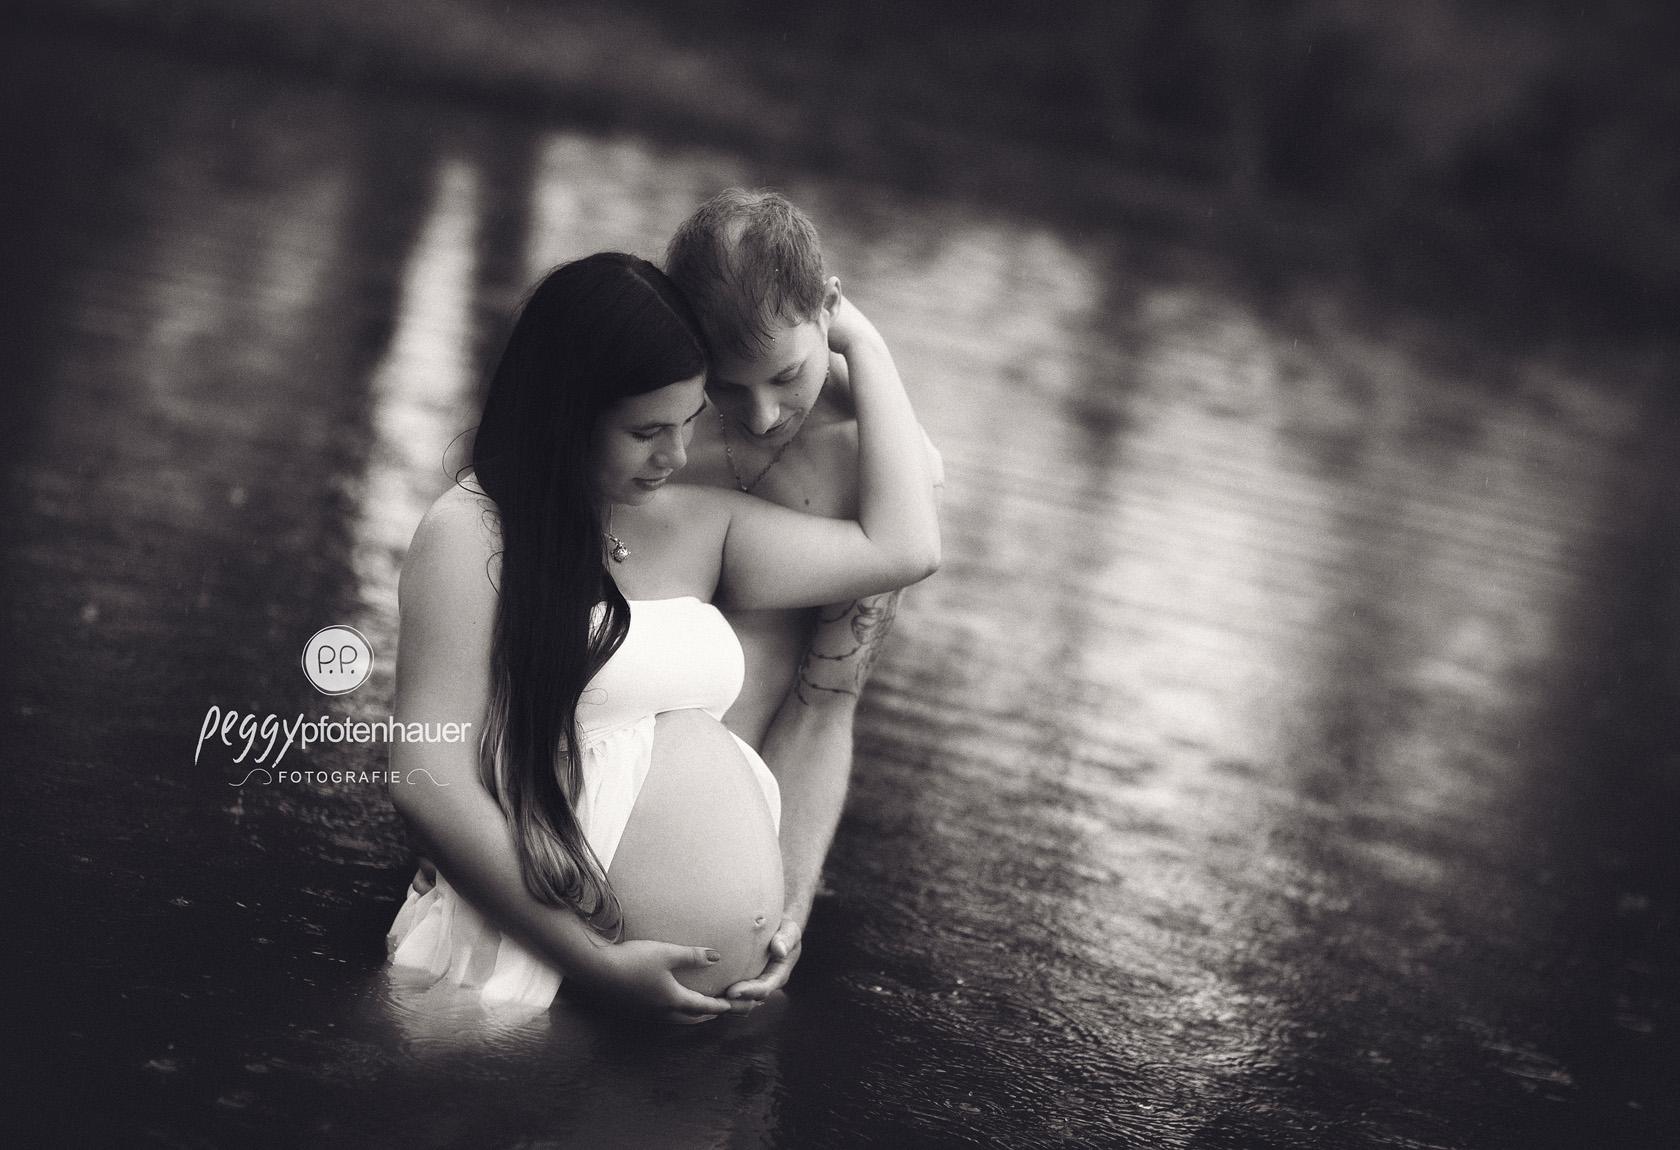 sinnliche Schwangerschaftsbilder Bamberg Peggy Pfotenhauer Fotografie